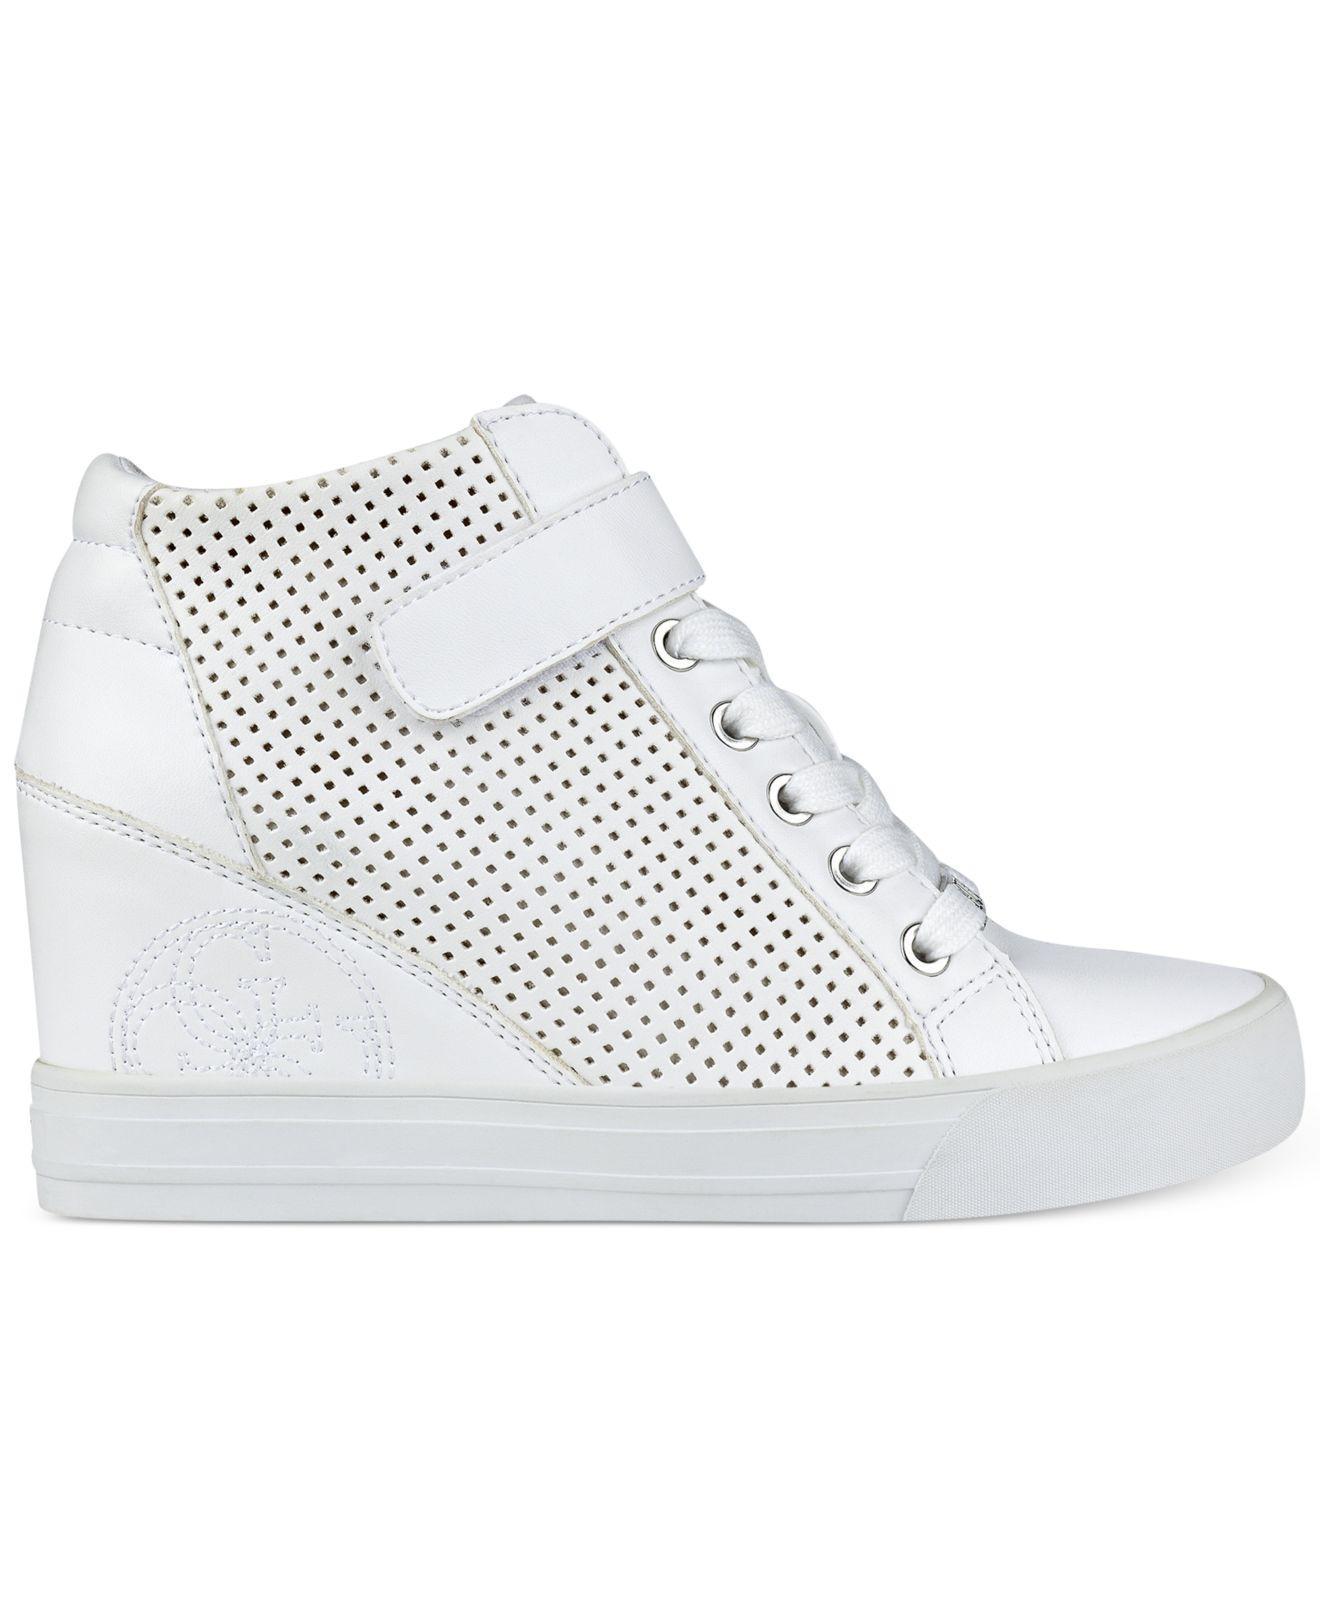 Decia Wedge Sneakers